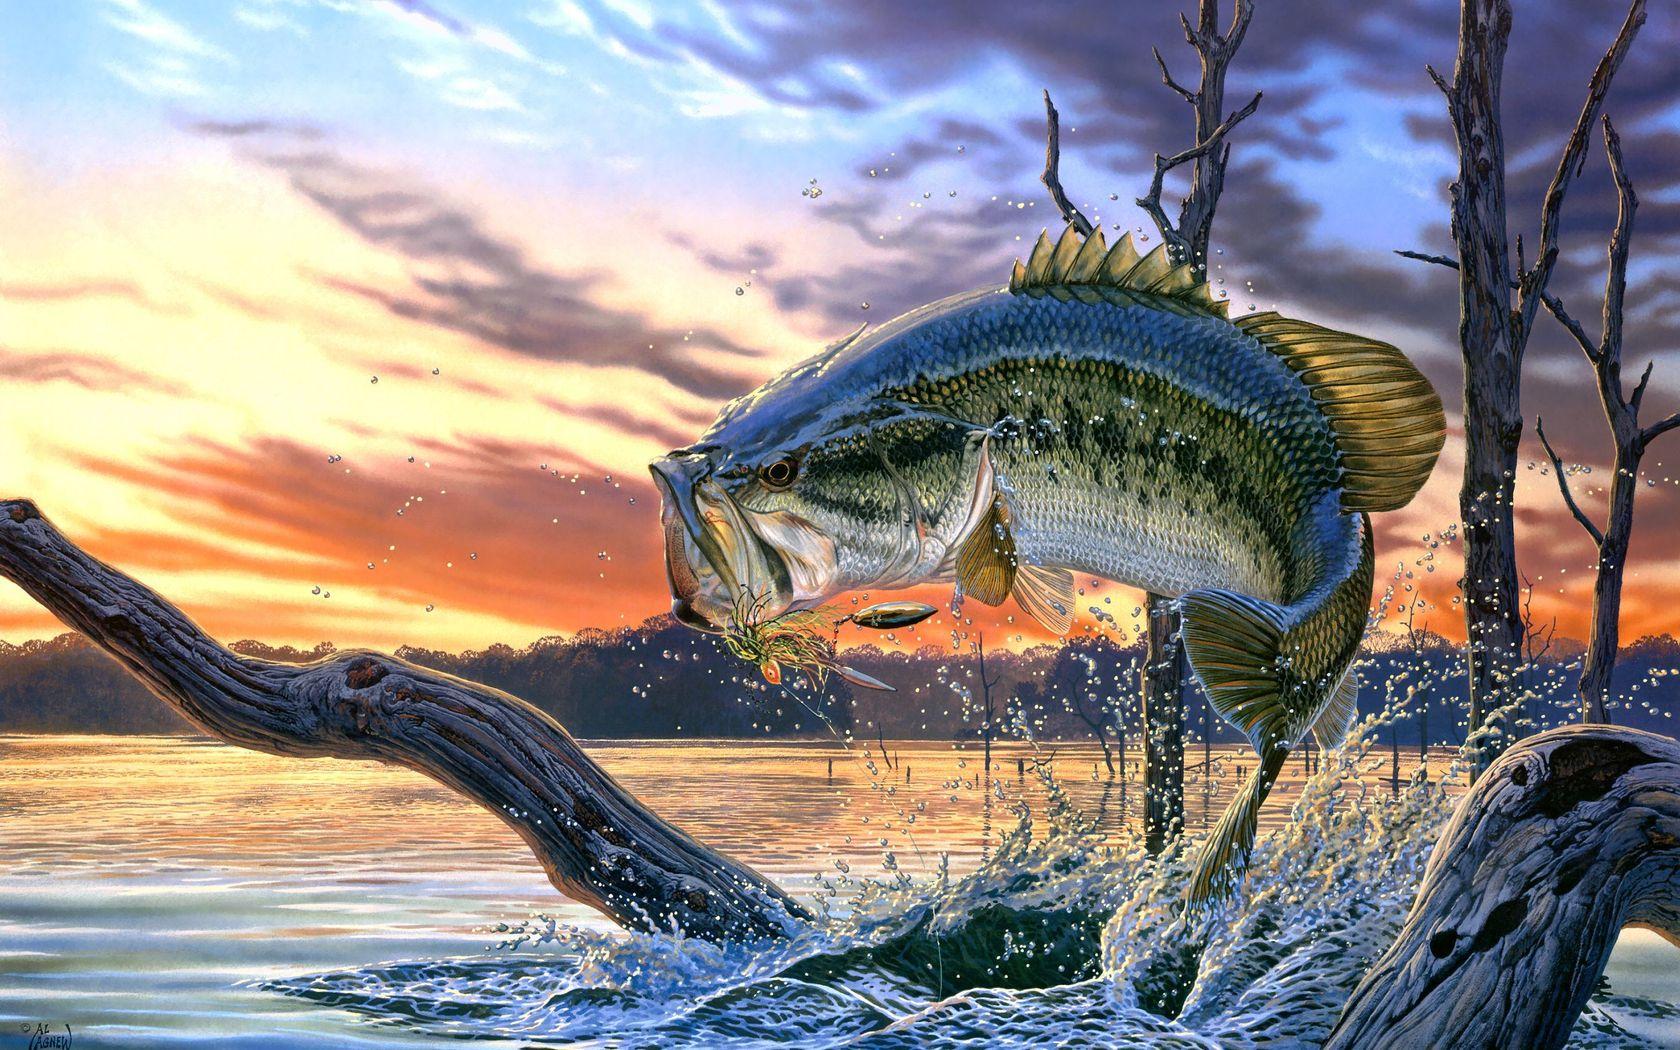 Largemouth Bass Fishing Wallpaper Background Screensaver Best 1680x1050